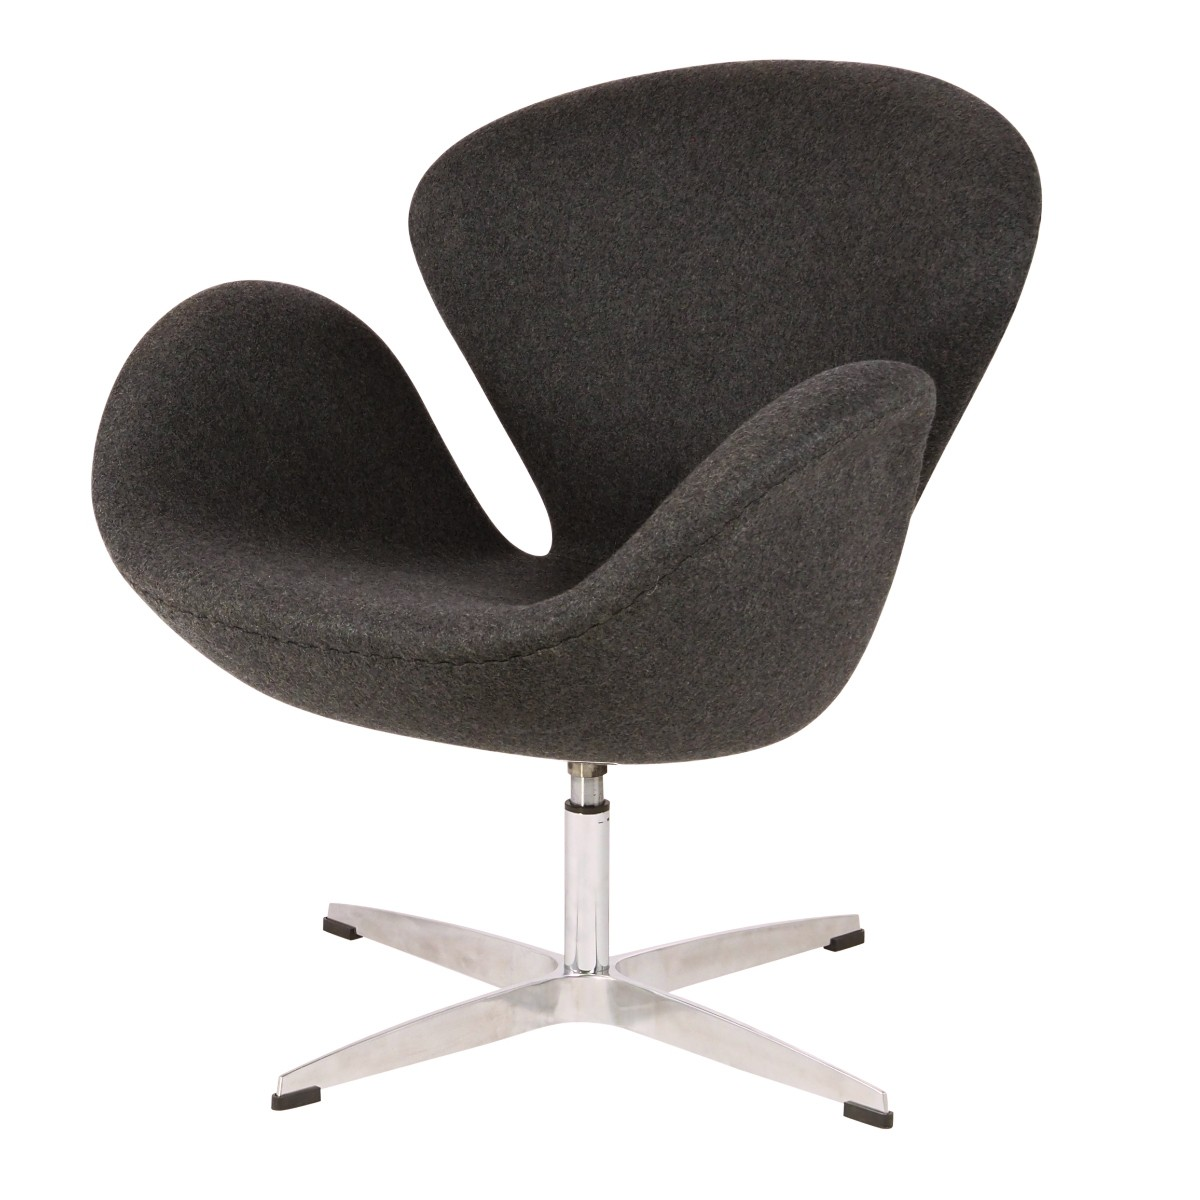 Jacobsen Lounge Chair Swan Design Lounge Chair